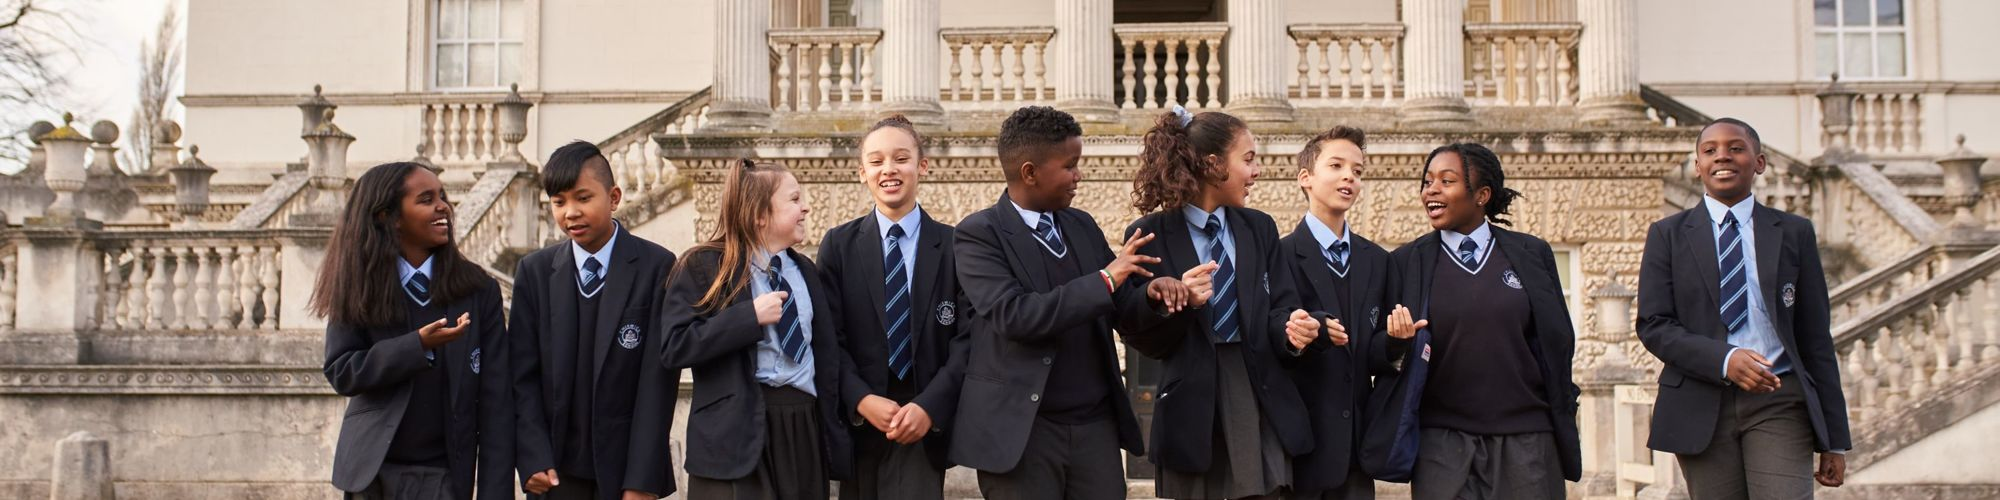 20 02 12.Chiswick School.2517 (web)